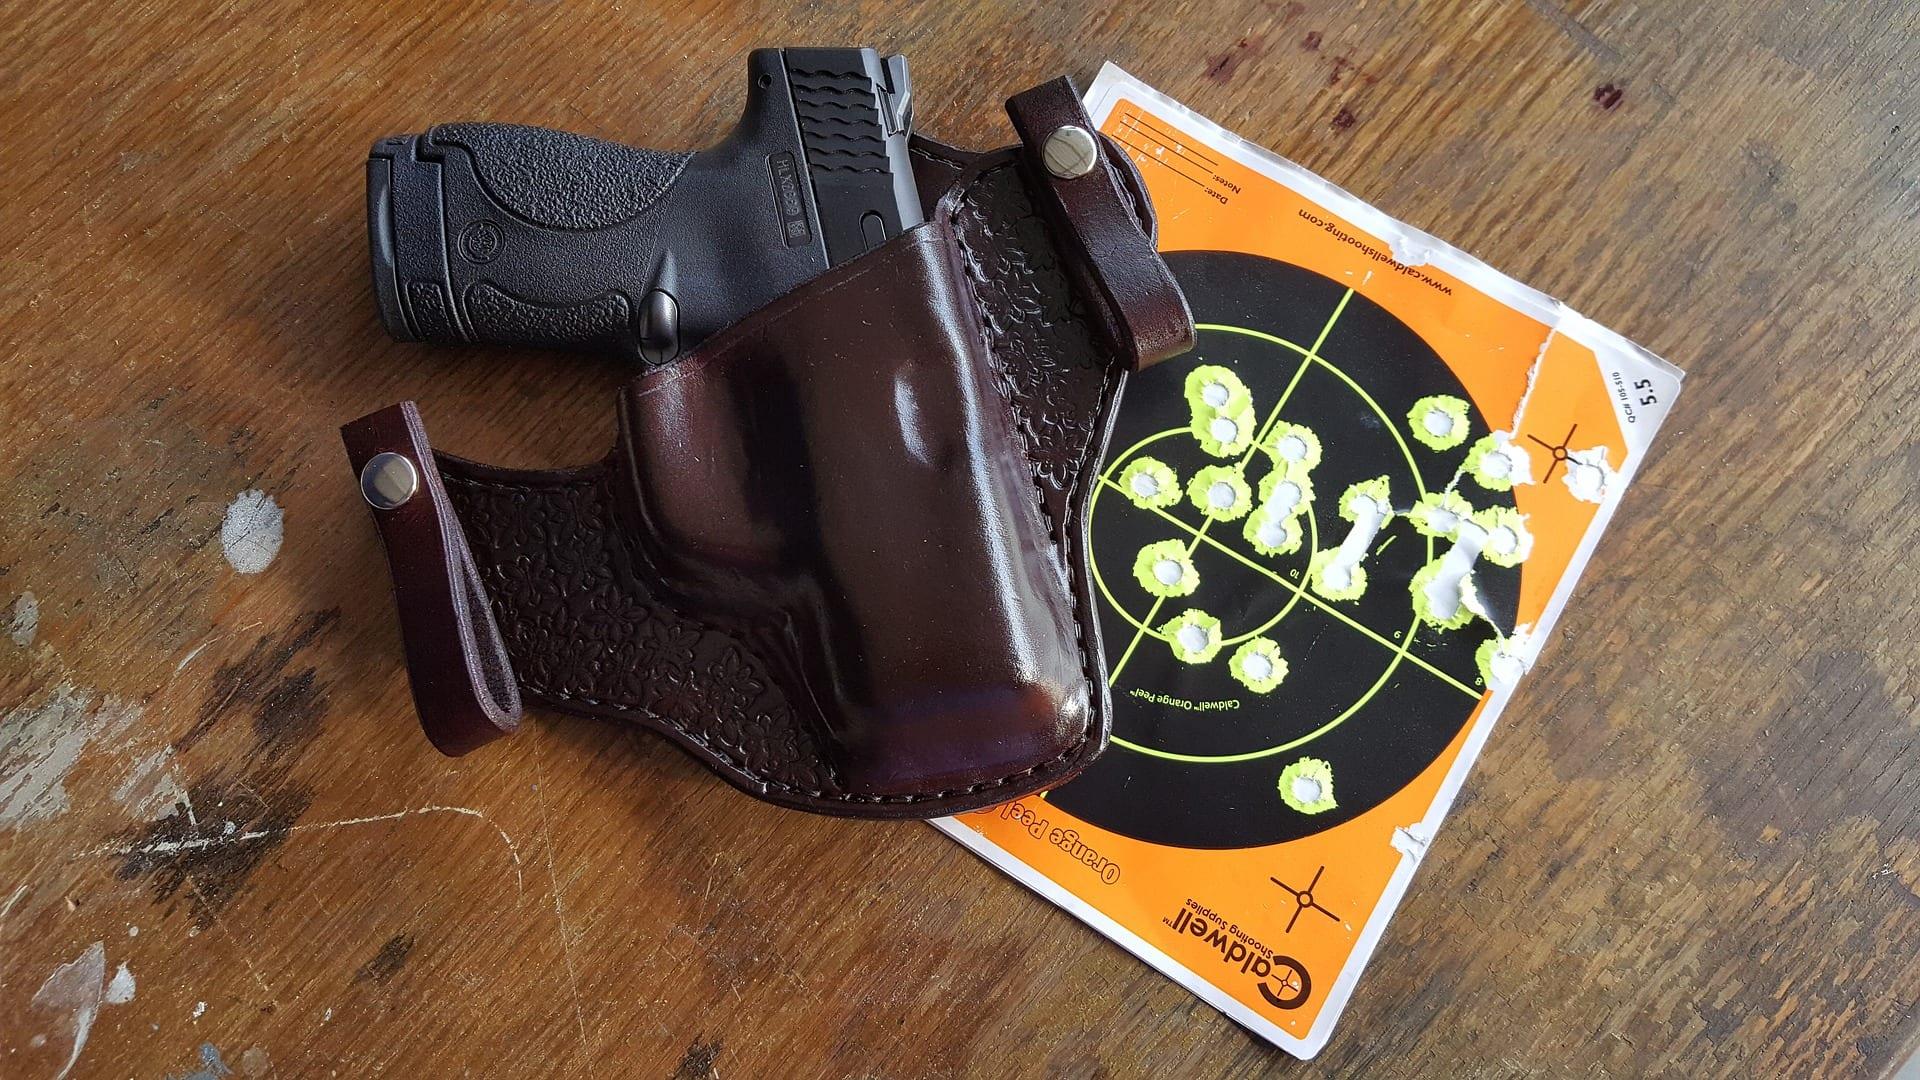 Are Pistols Illegal In California? 1